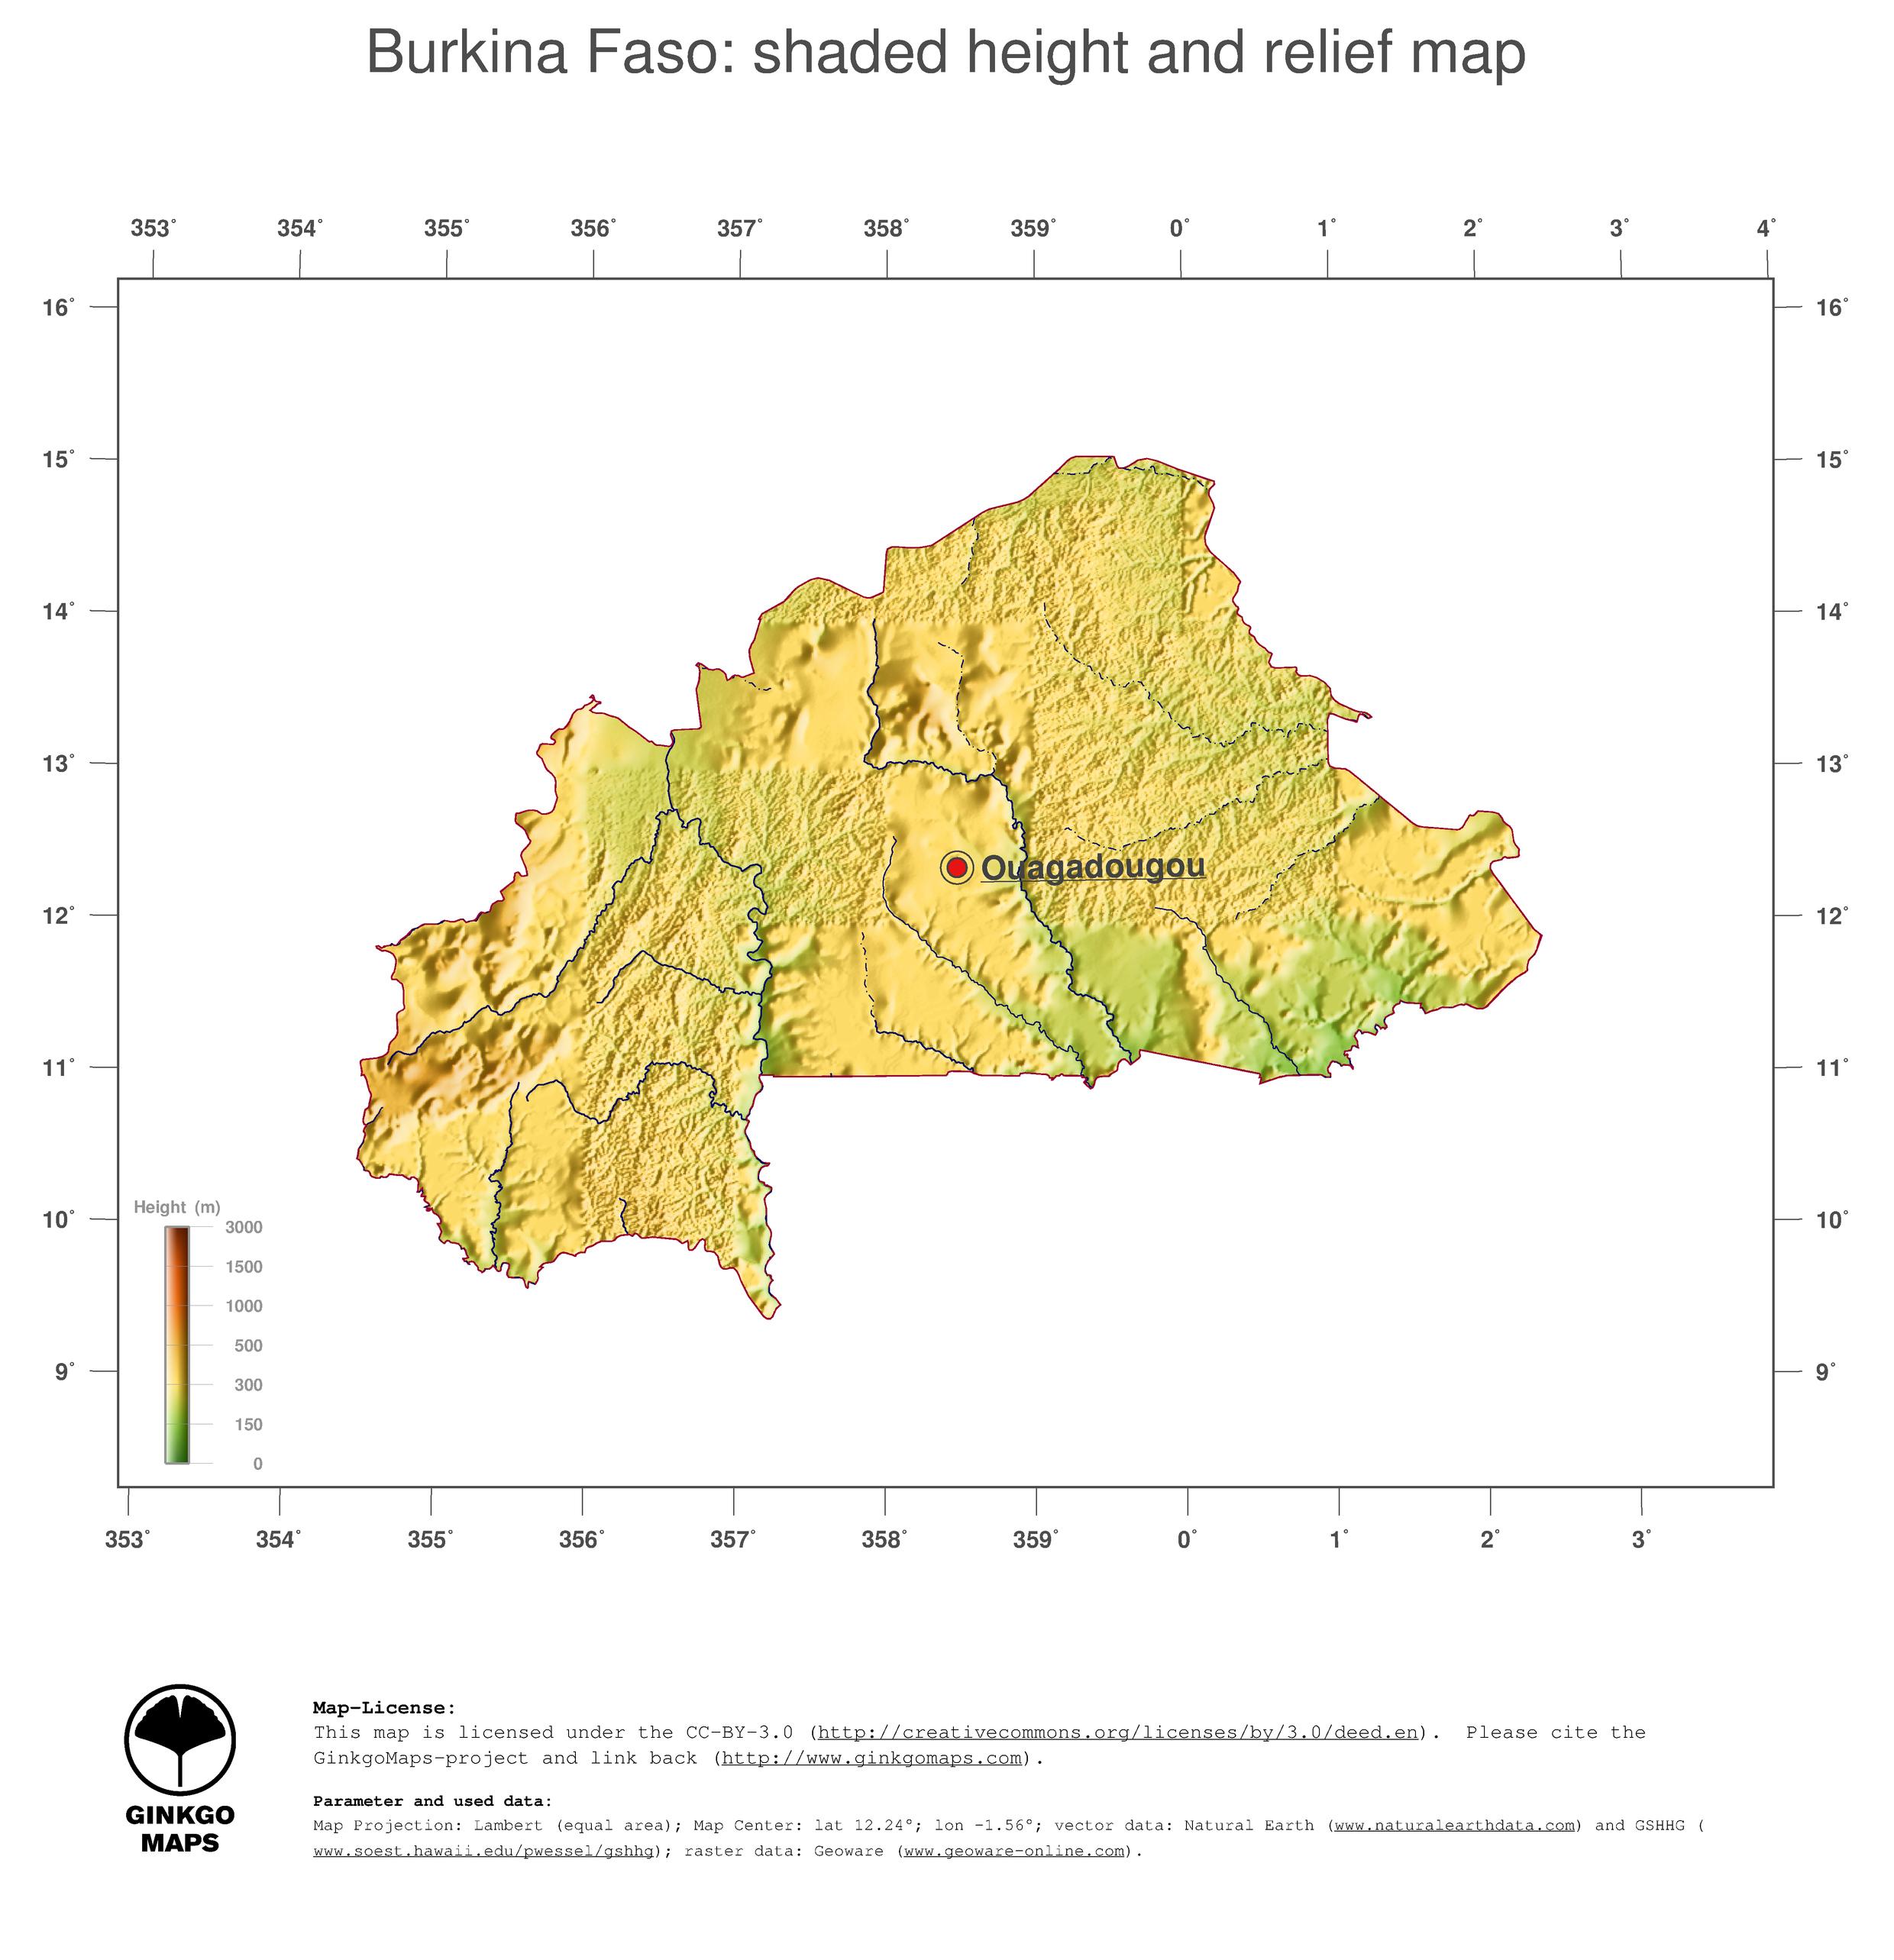 Map Burkina Faso GinkgoMaps continent Africa region Burkina Faso